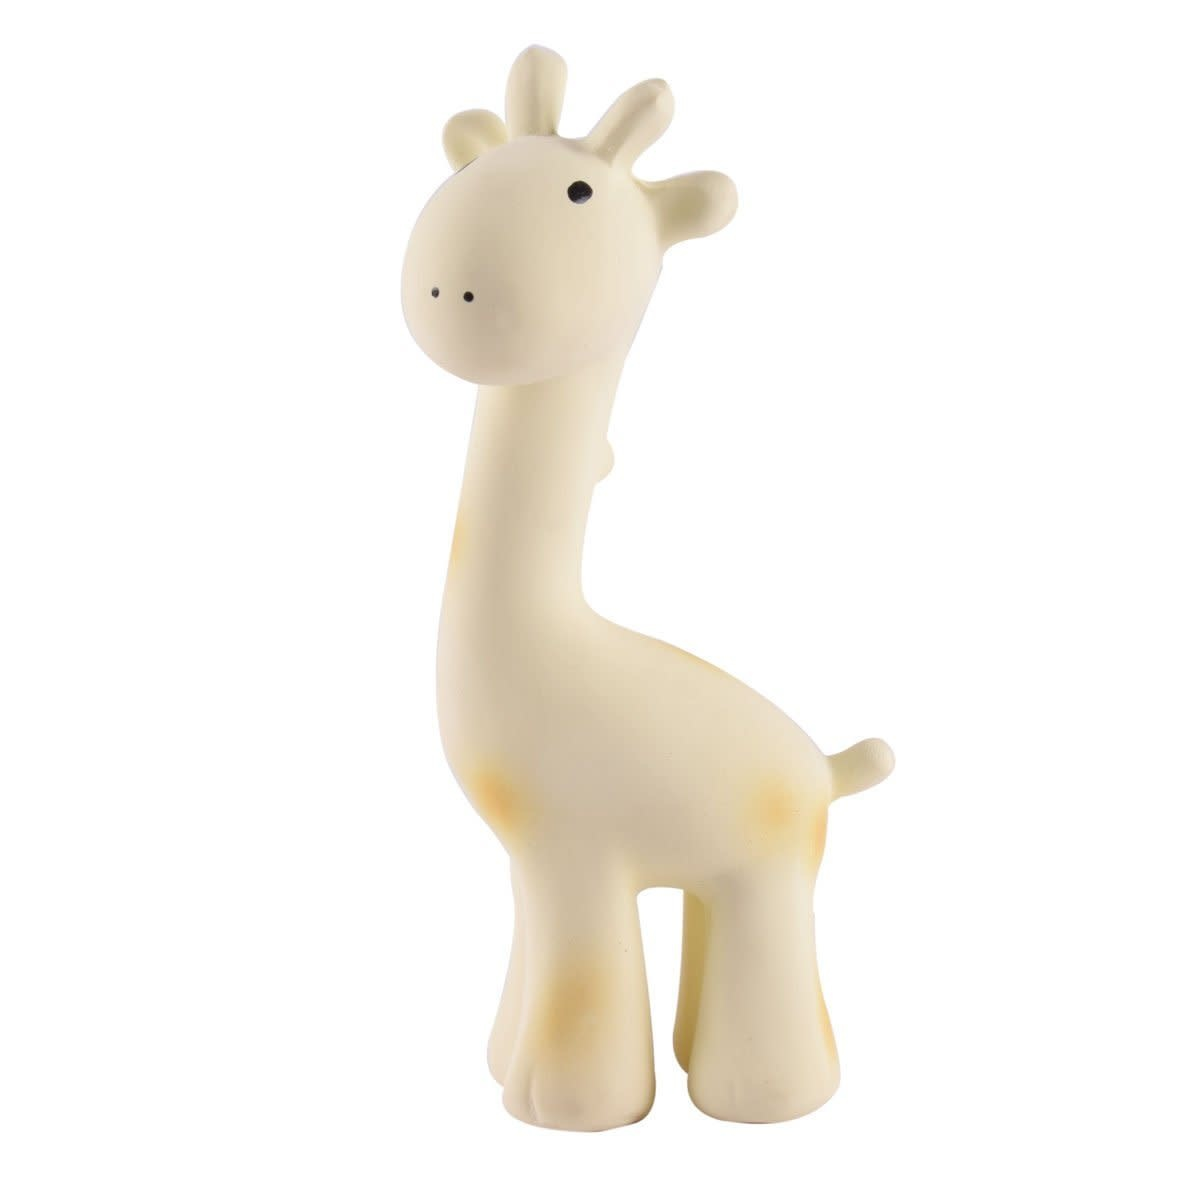 Tikiri Bijtspeeltje - Giraf-2